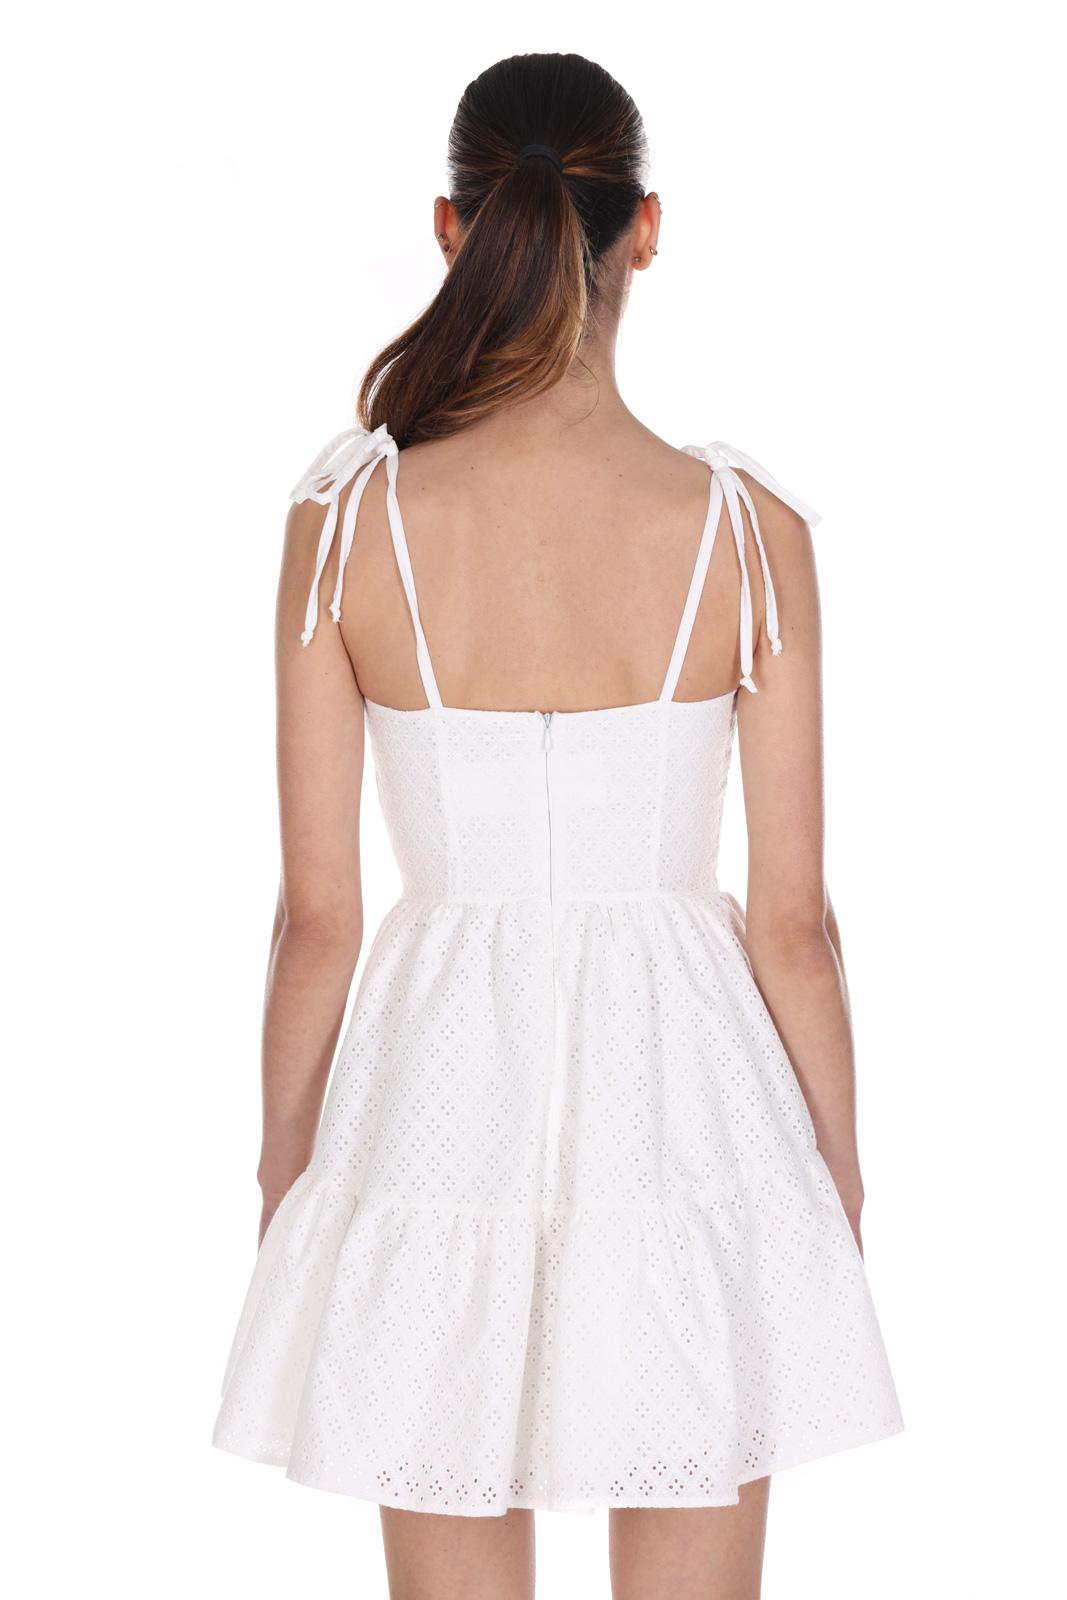 FEMINISTA   Dress   CAPRIBIANCO